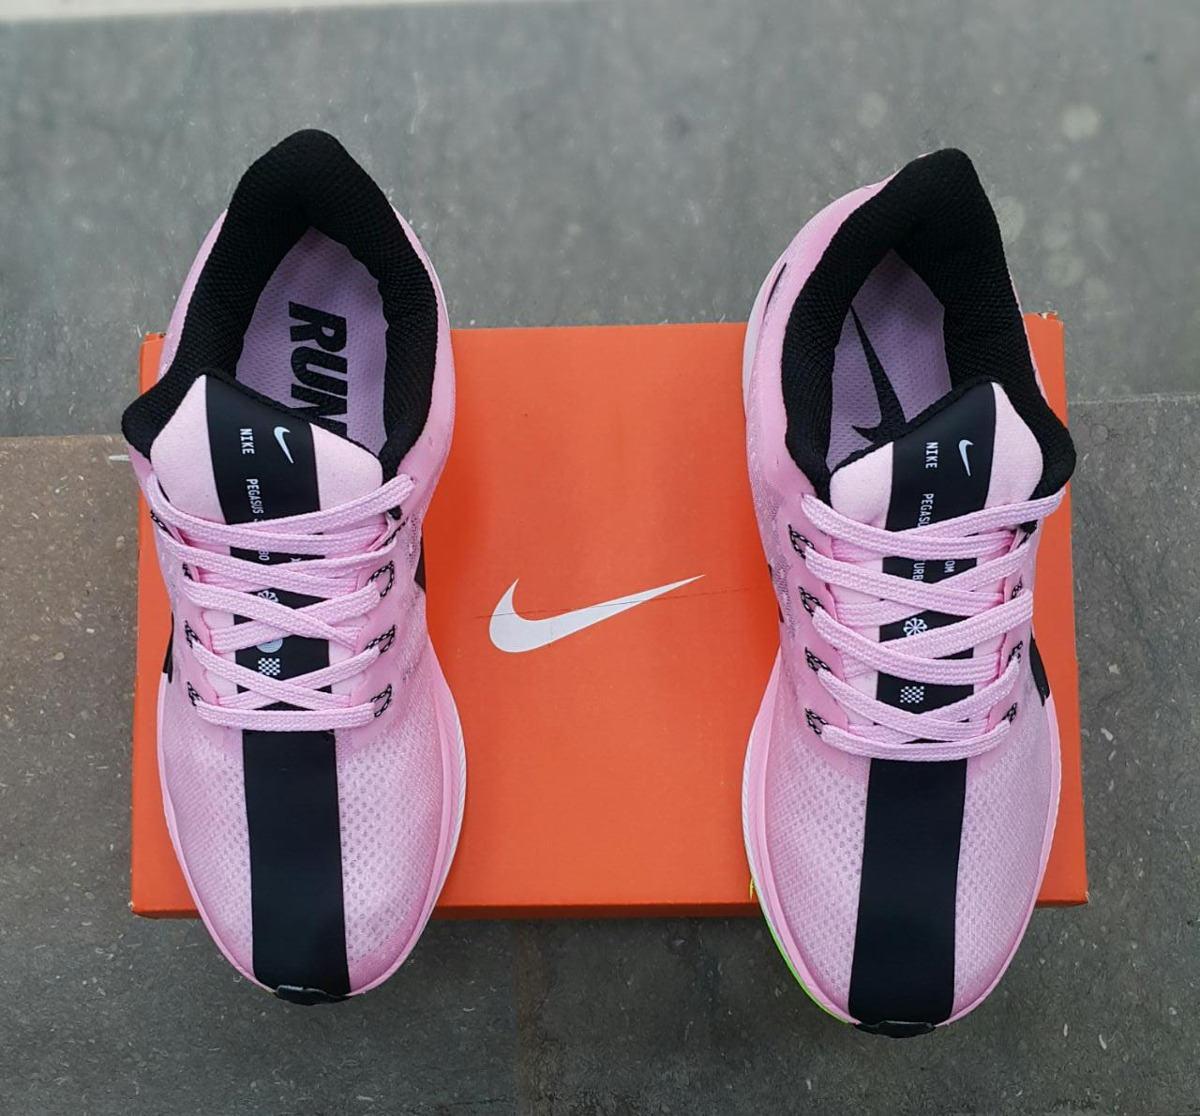 e95afaa65a4b7 zapatillas nike pegasus mujer deportivas excelente calidad. Cargando zoom.